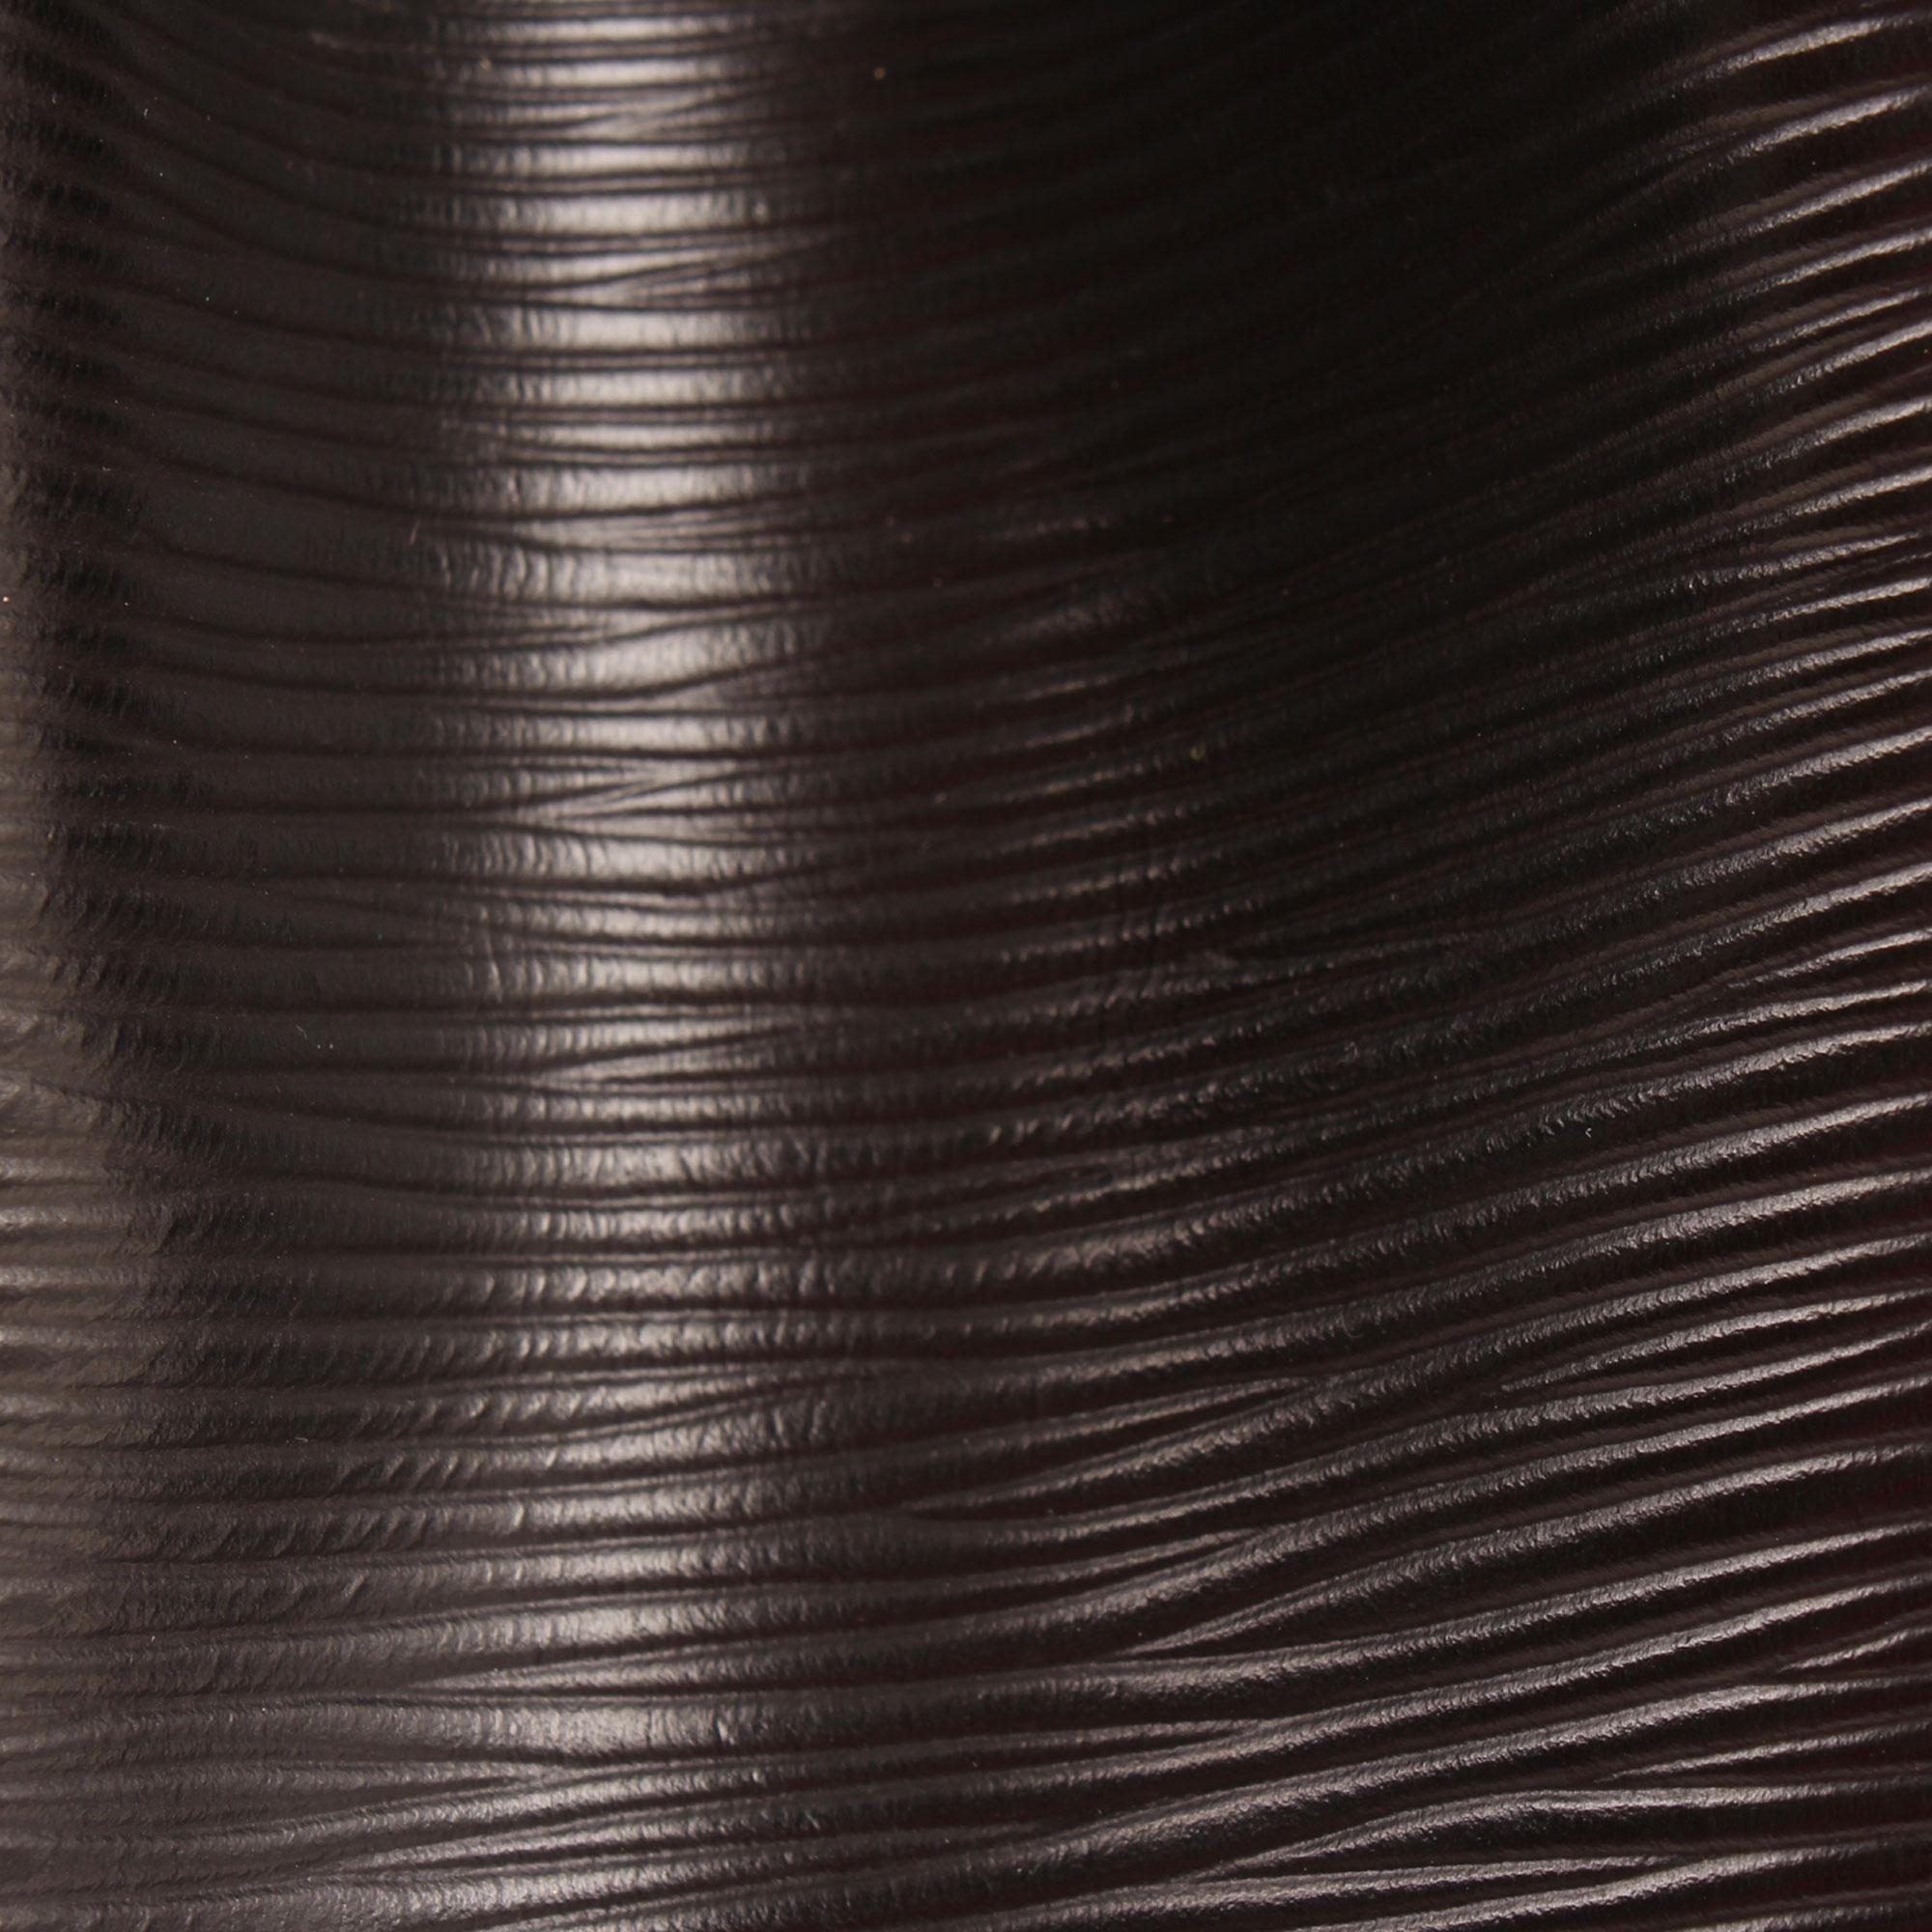 Imagen de detalle de la piel del louis vuitton bolso noe epi negro